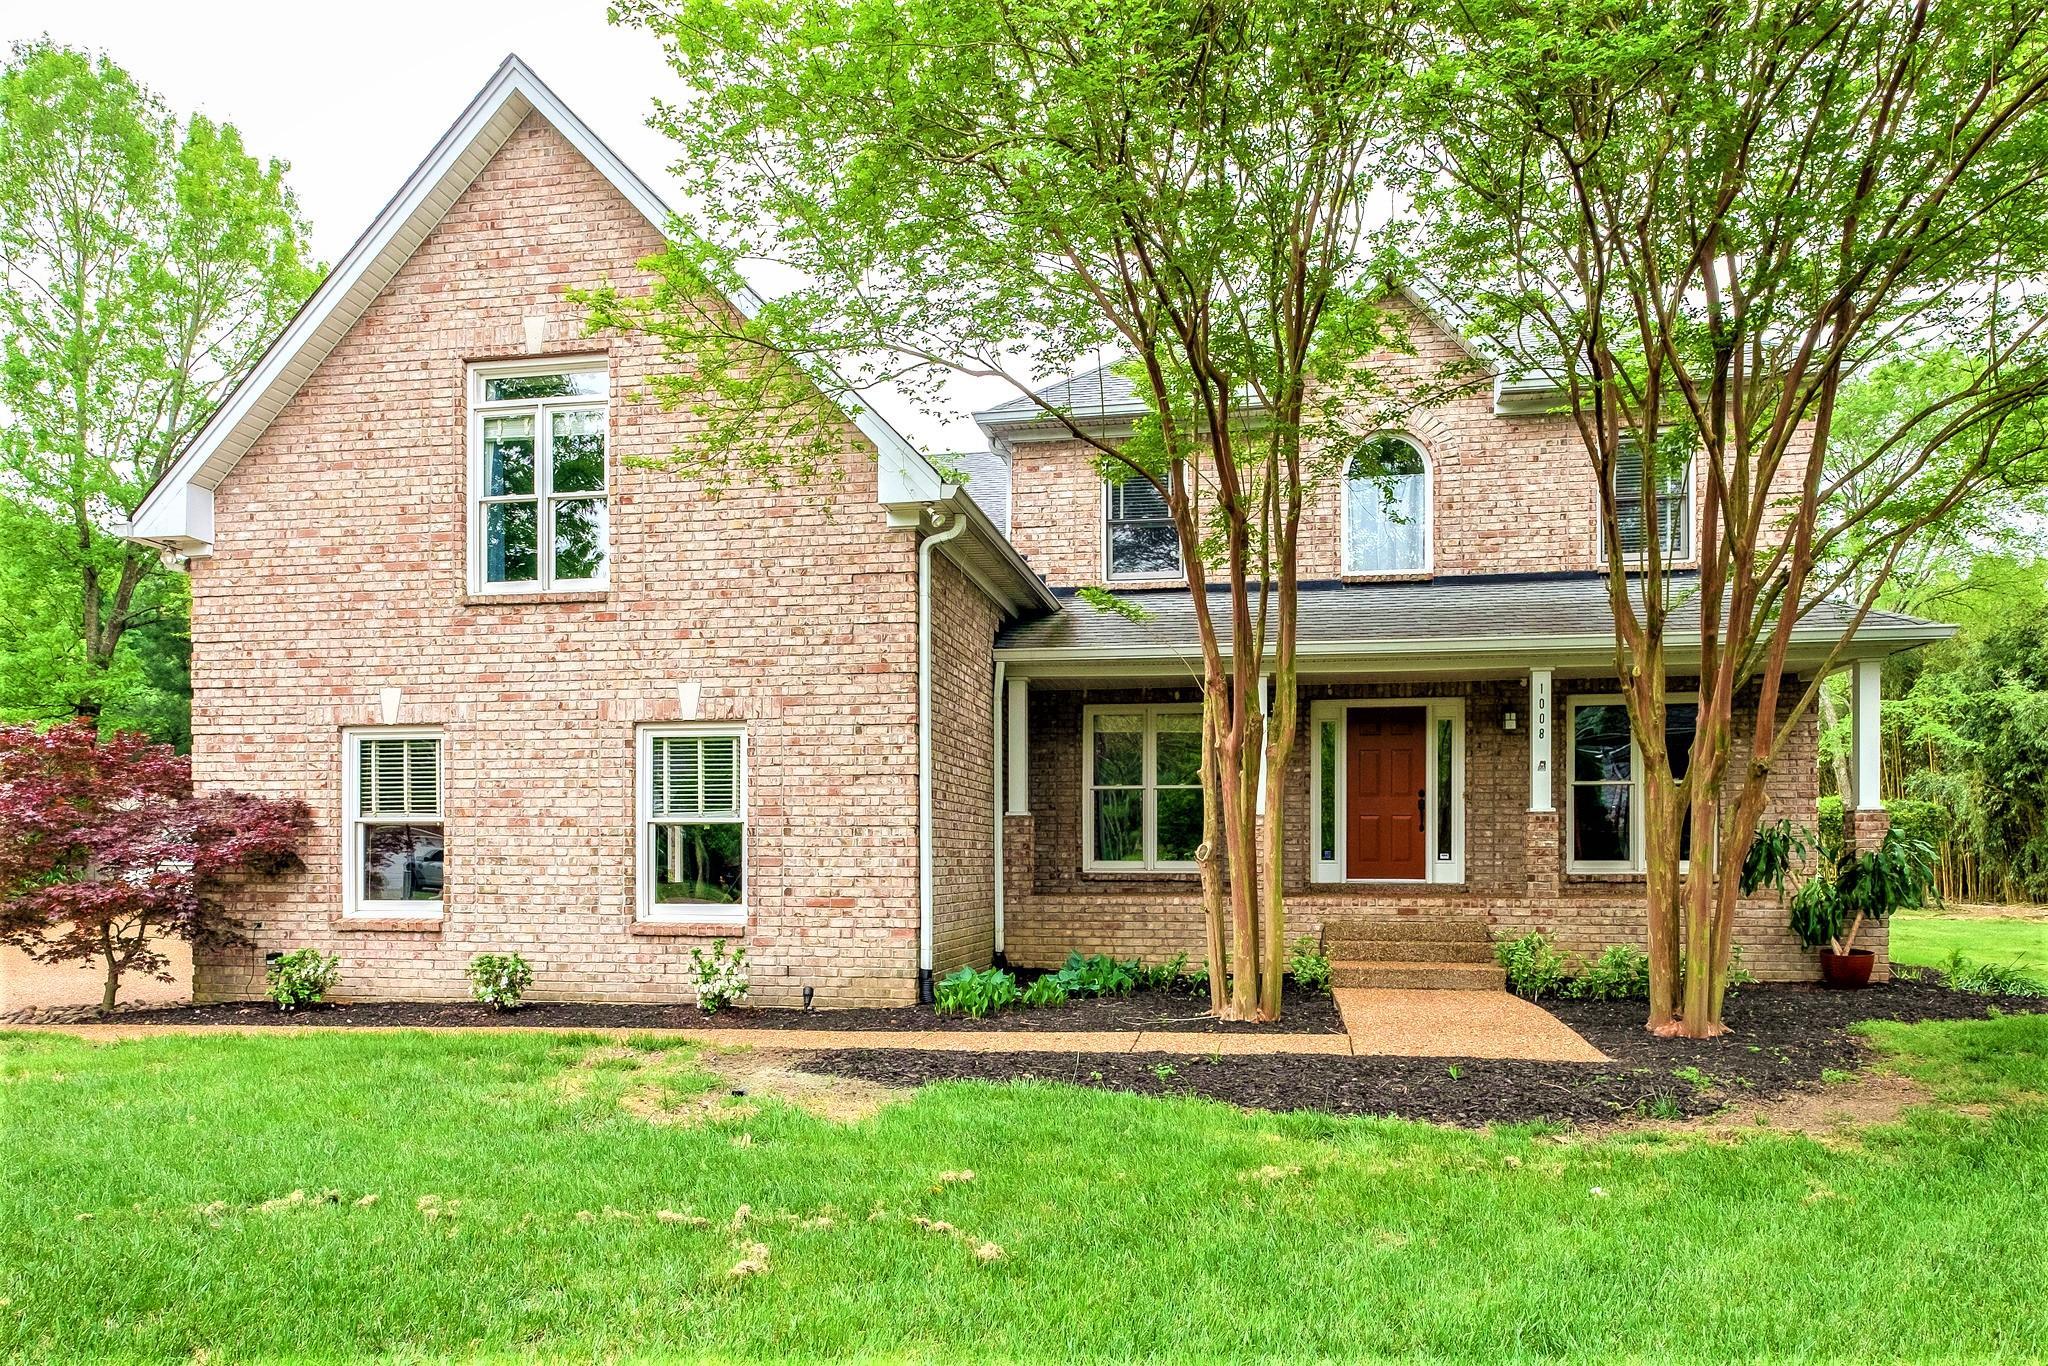 1008 E Point Cove, Hermitage, TN 37076 - Hermitage, TN real estate listing